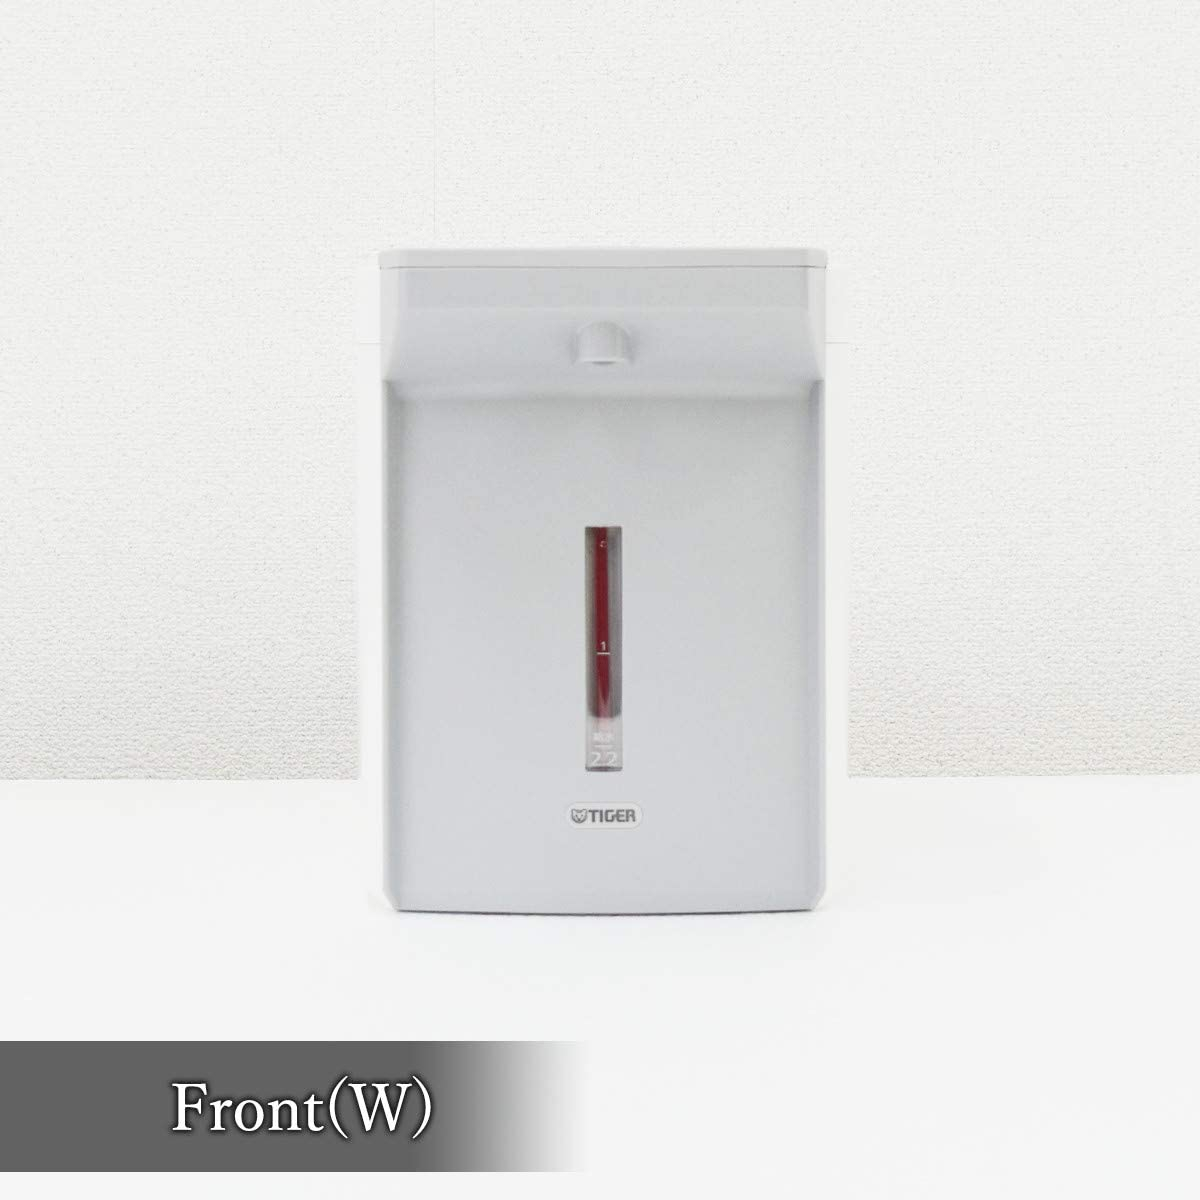 TIGER(タイガー)蒸気レスVE電気まほうびん PIJ-A220の商品画像9